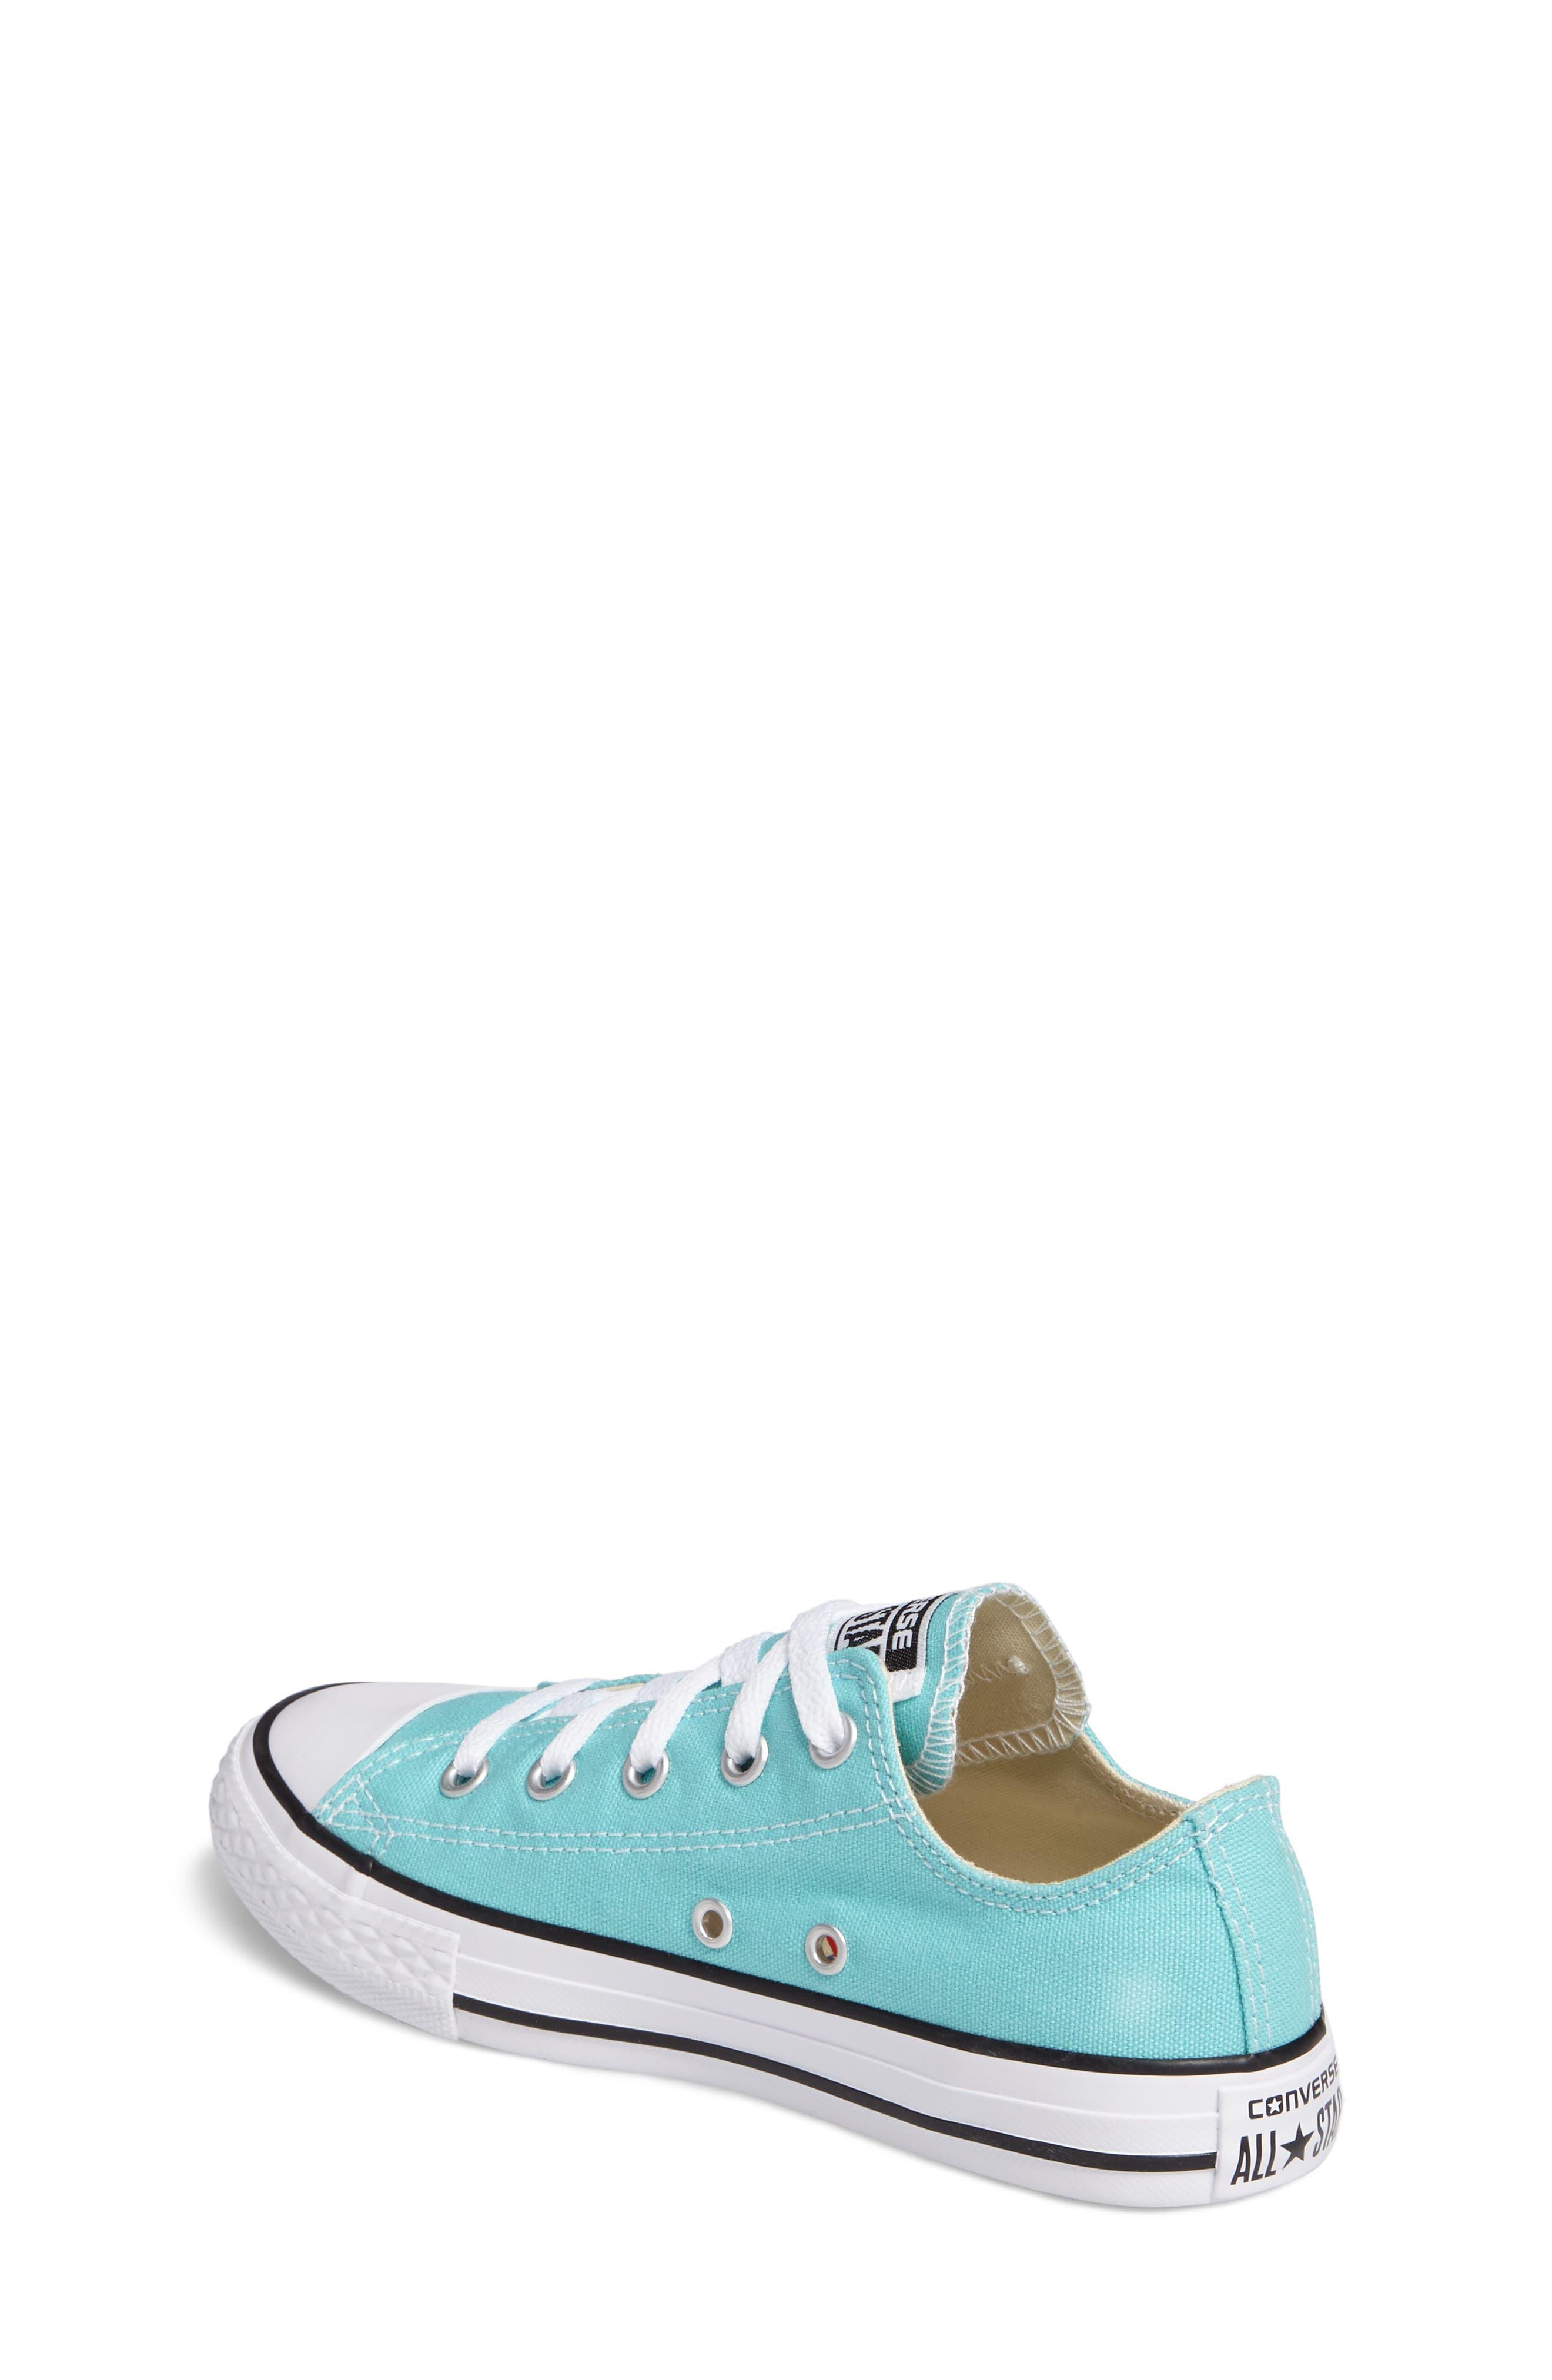 Chuck Taylor<sup>®</sup> All Star<sup>®</sup> Low Top Sneaker,                             Alternate thumbnail 2, color,                             Light Aqua/ Light Aqua